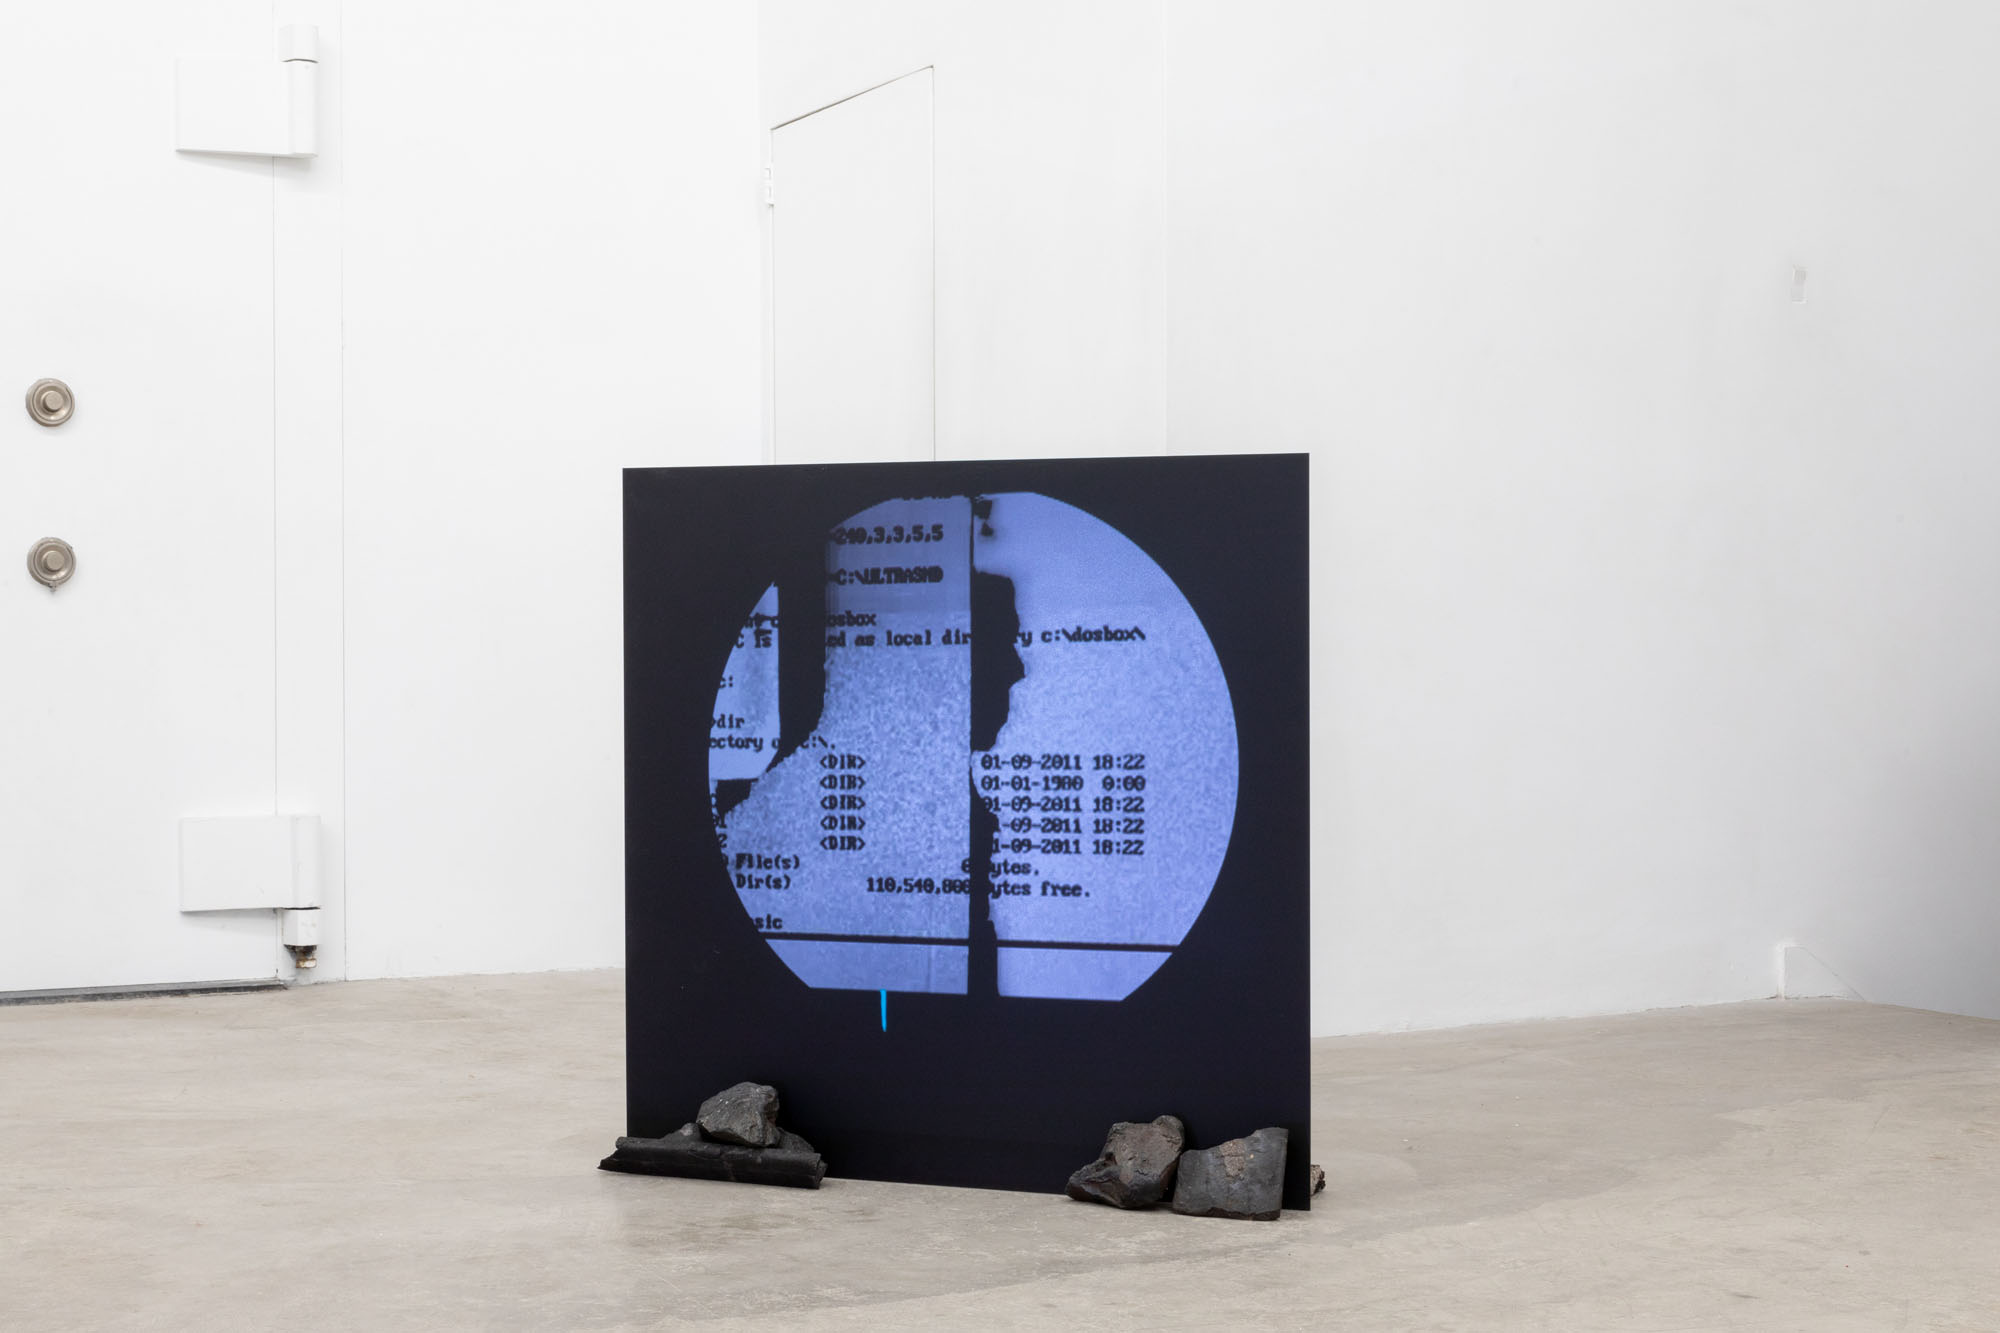 44302c870 Timothy Yanick Hunter, Basic Instructions, 2019, Video, acrylic sheet, 5:15  min